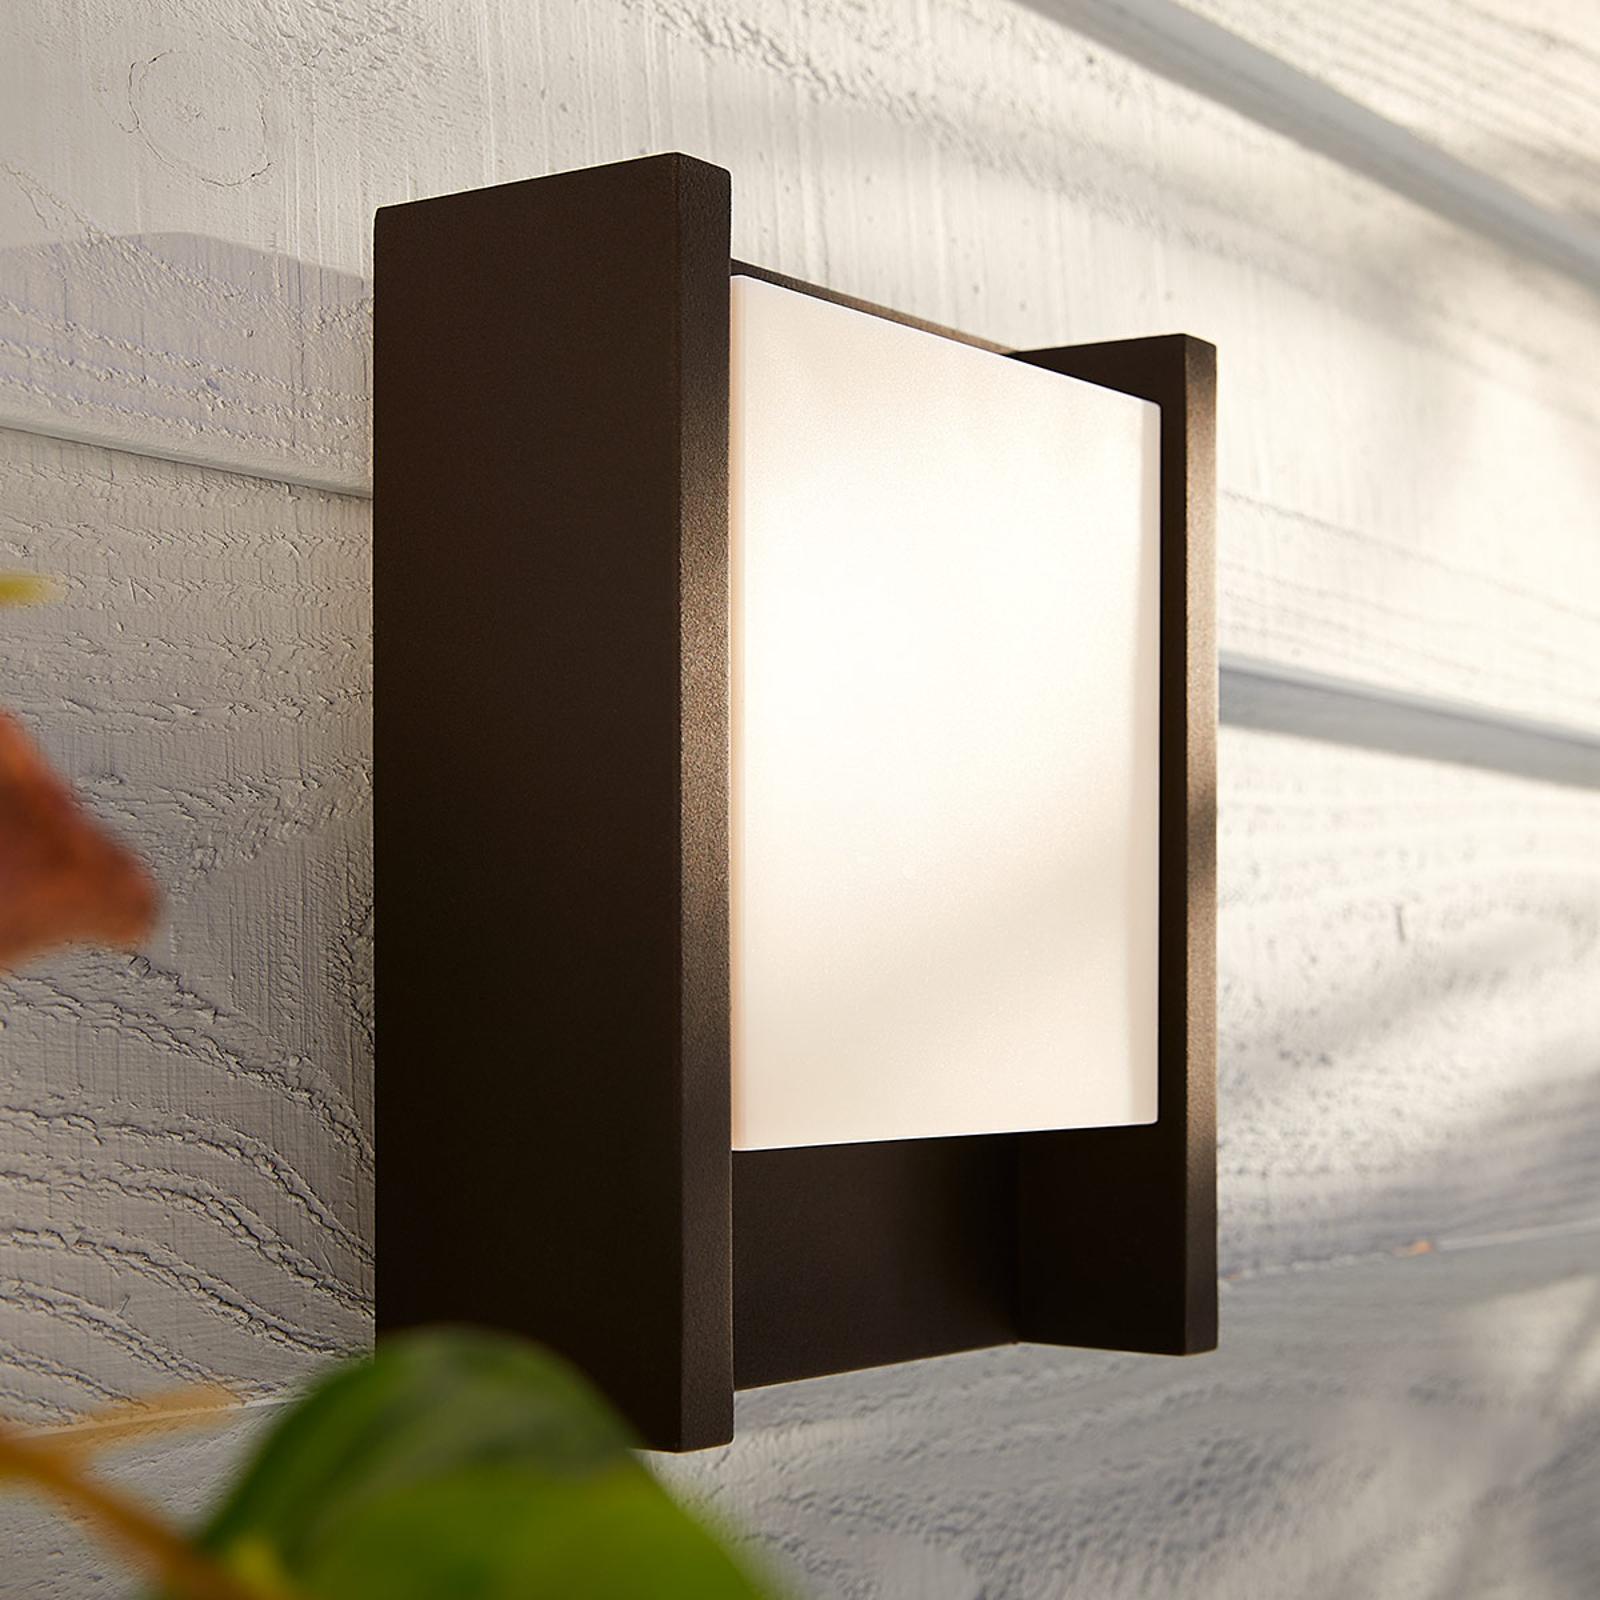 Philips Hue White Fuzo udendørsvæglampe, 22x16cm